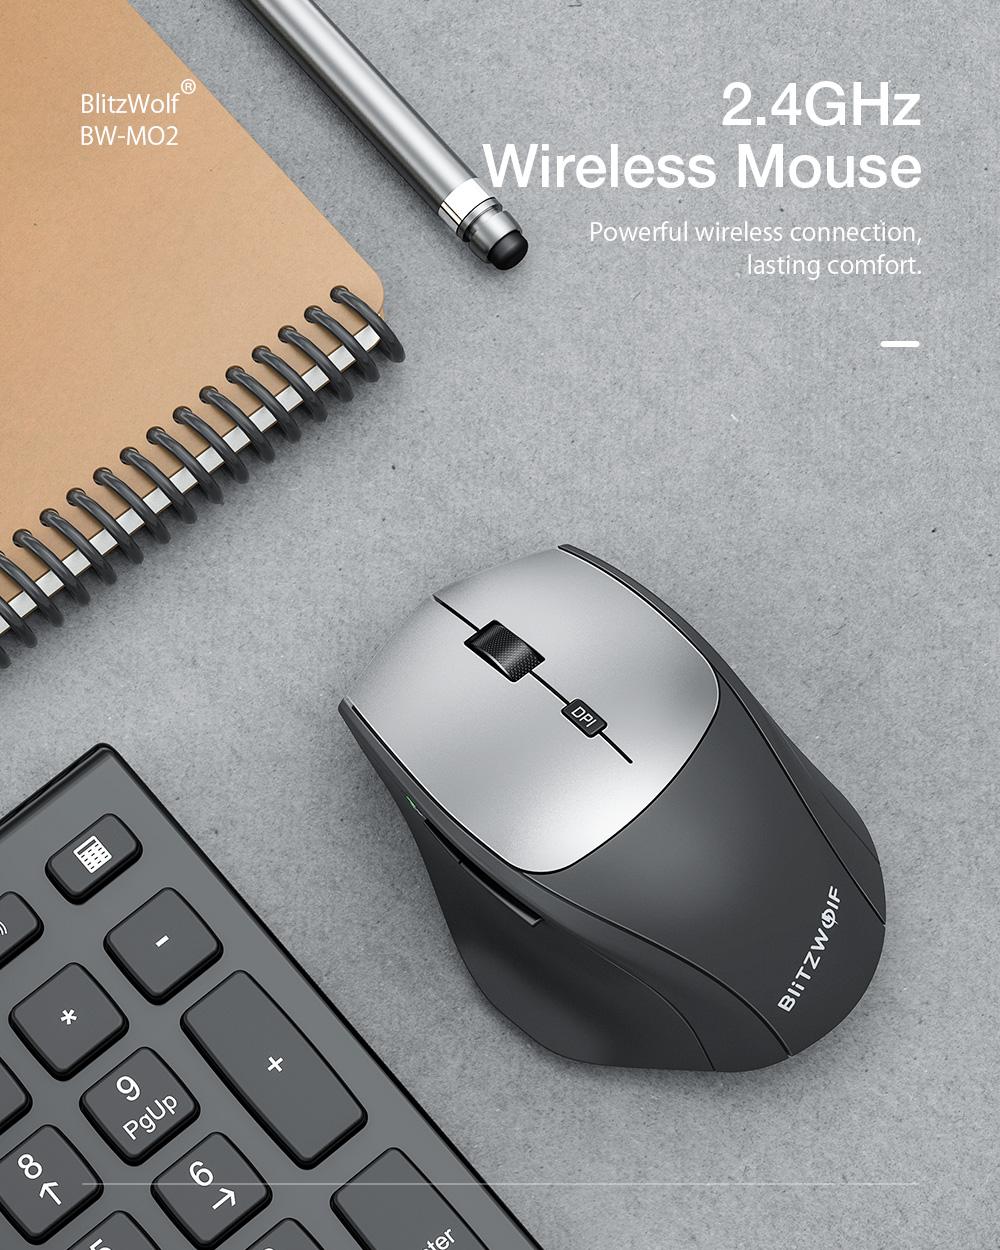 Blitzwolf BW-MO2 mouse